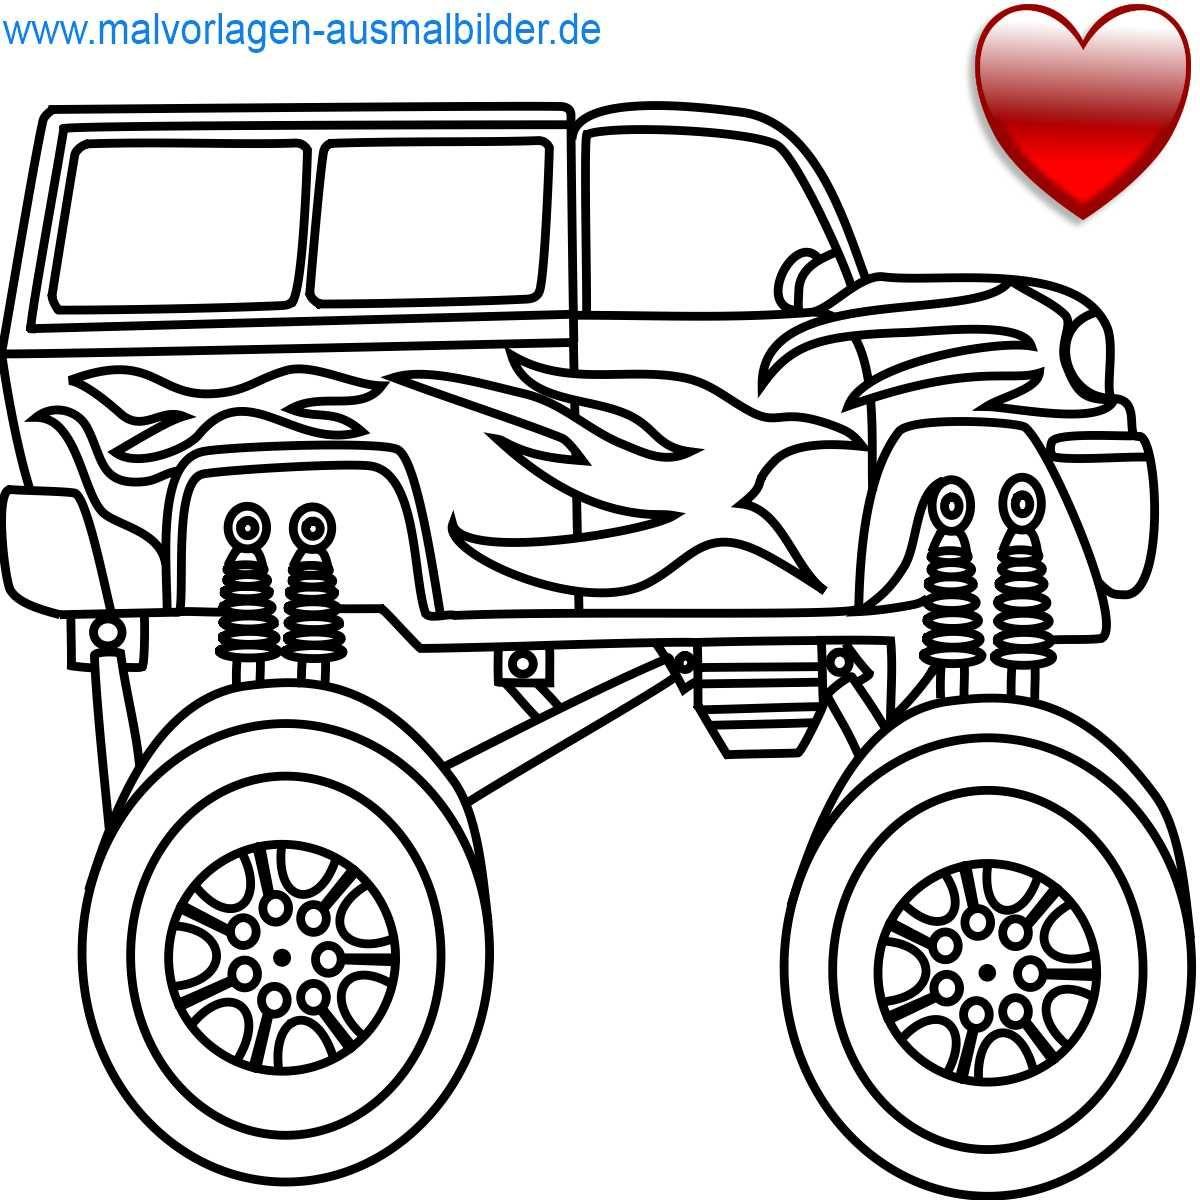 Ausmalbilder Playmobil Autos in 10  Ausmalbilder, Playmobil